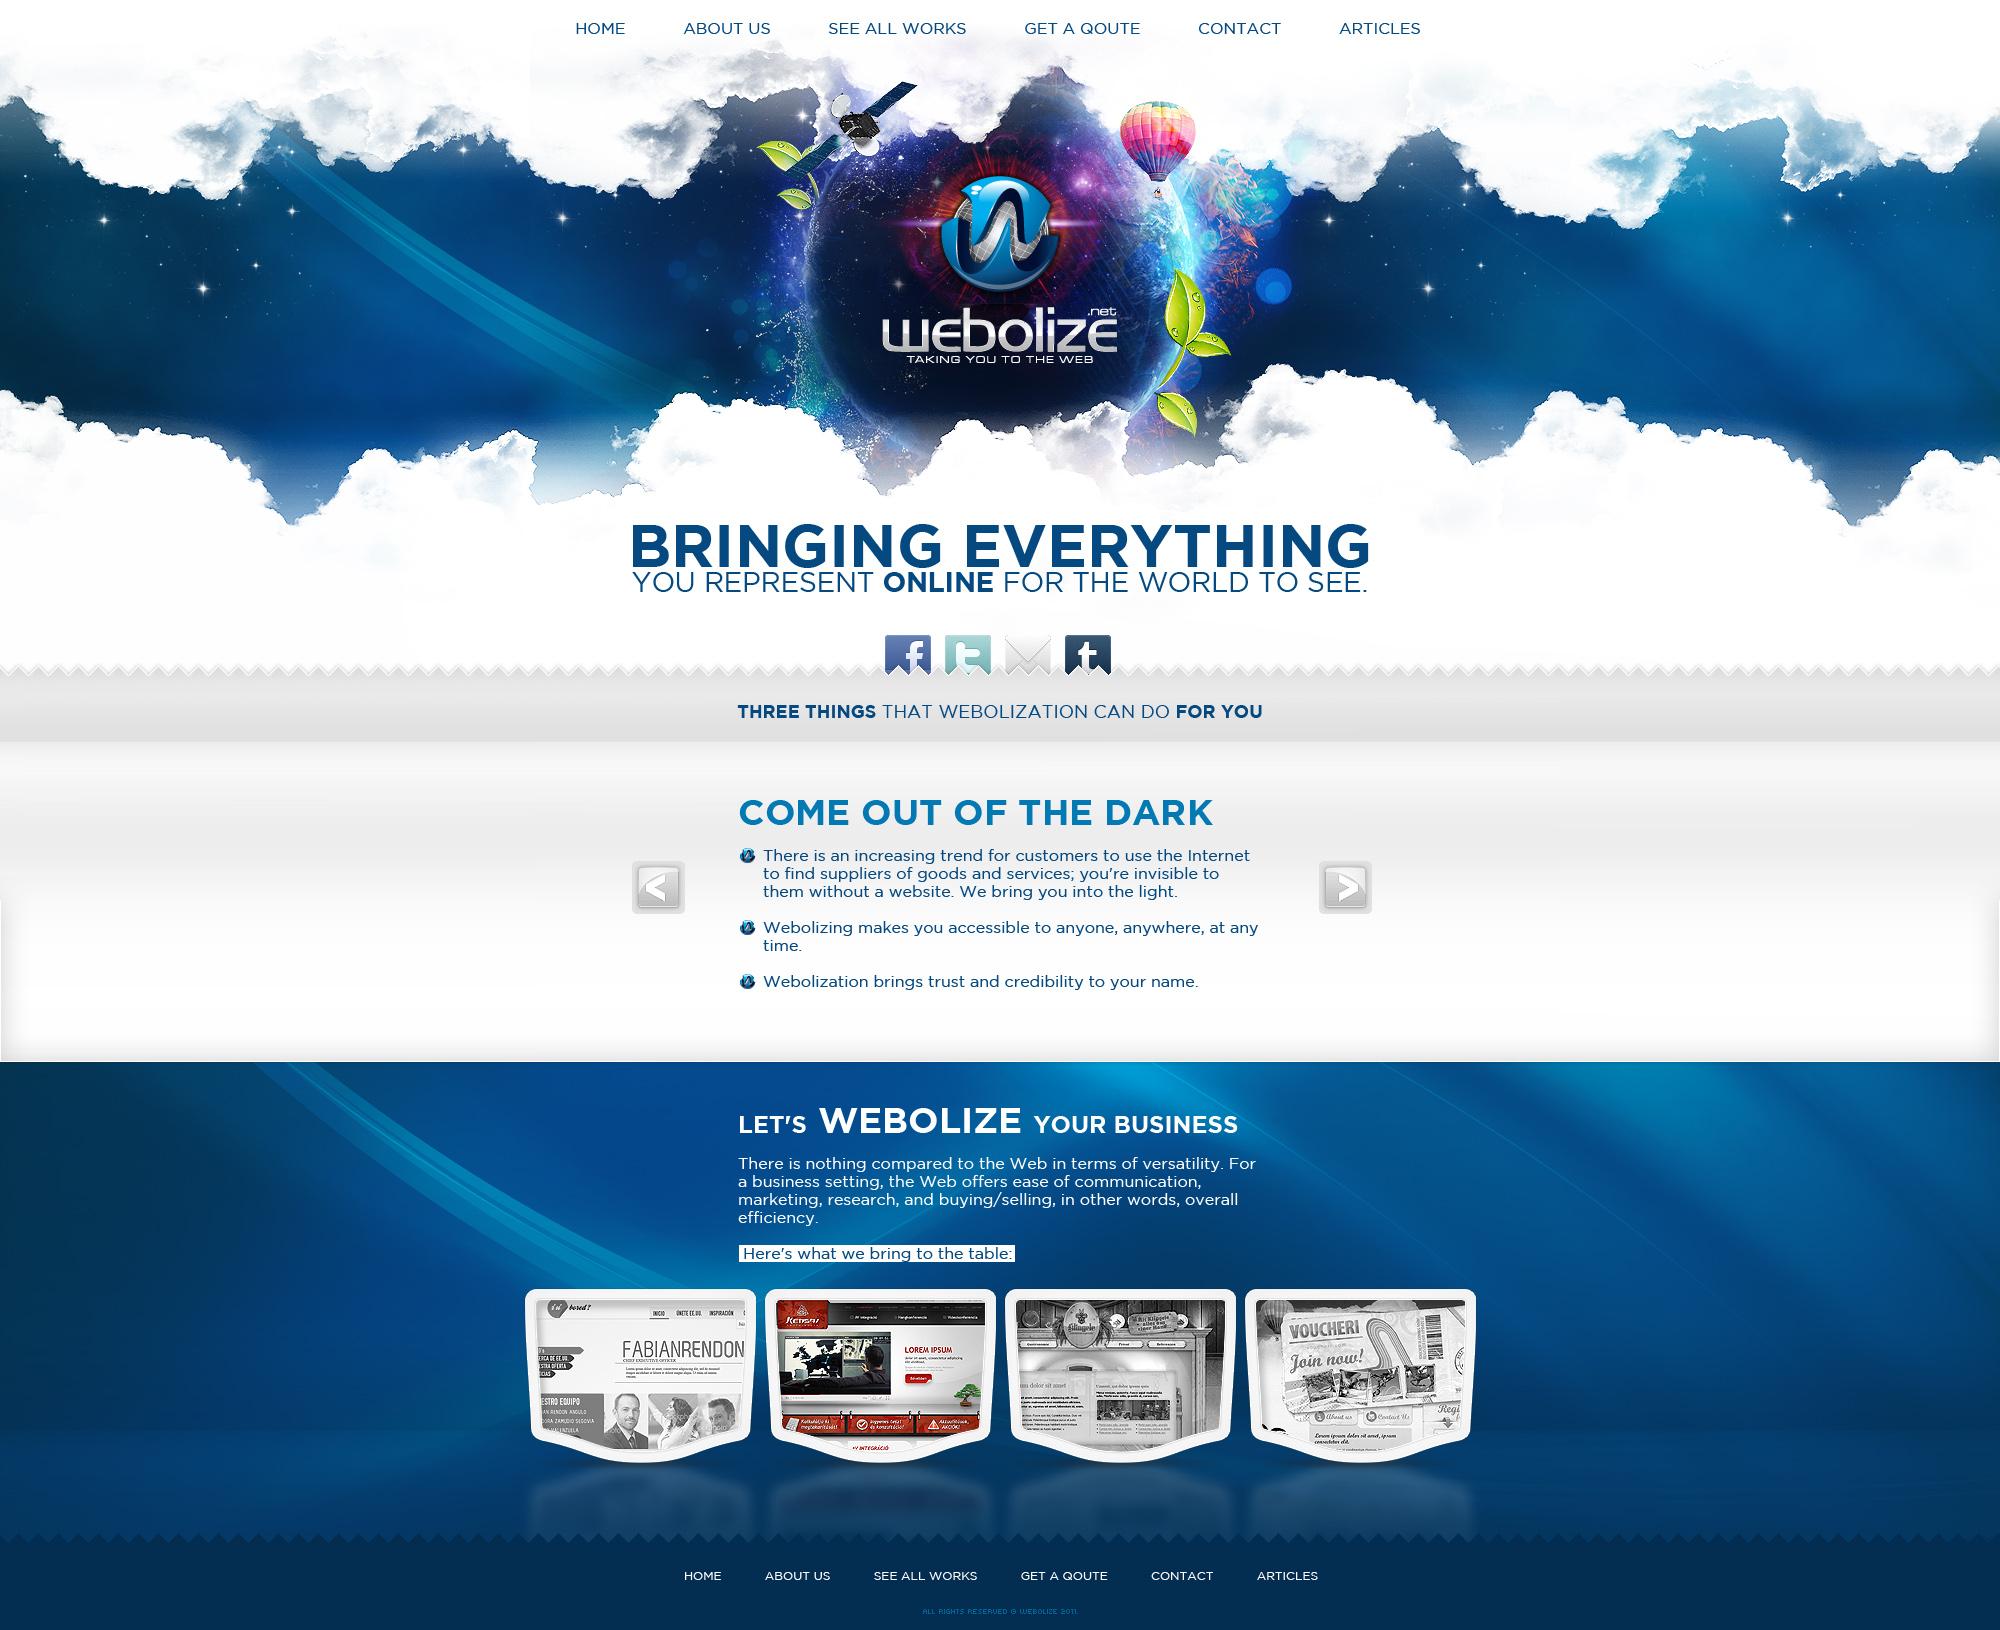 Web Design: Webolize by VictoryDesign